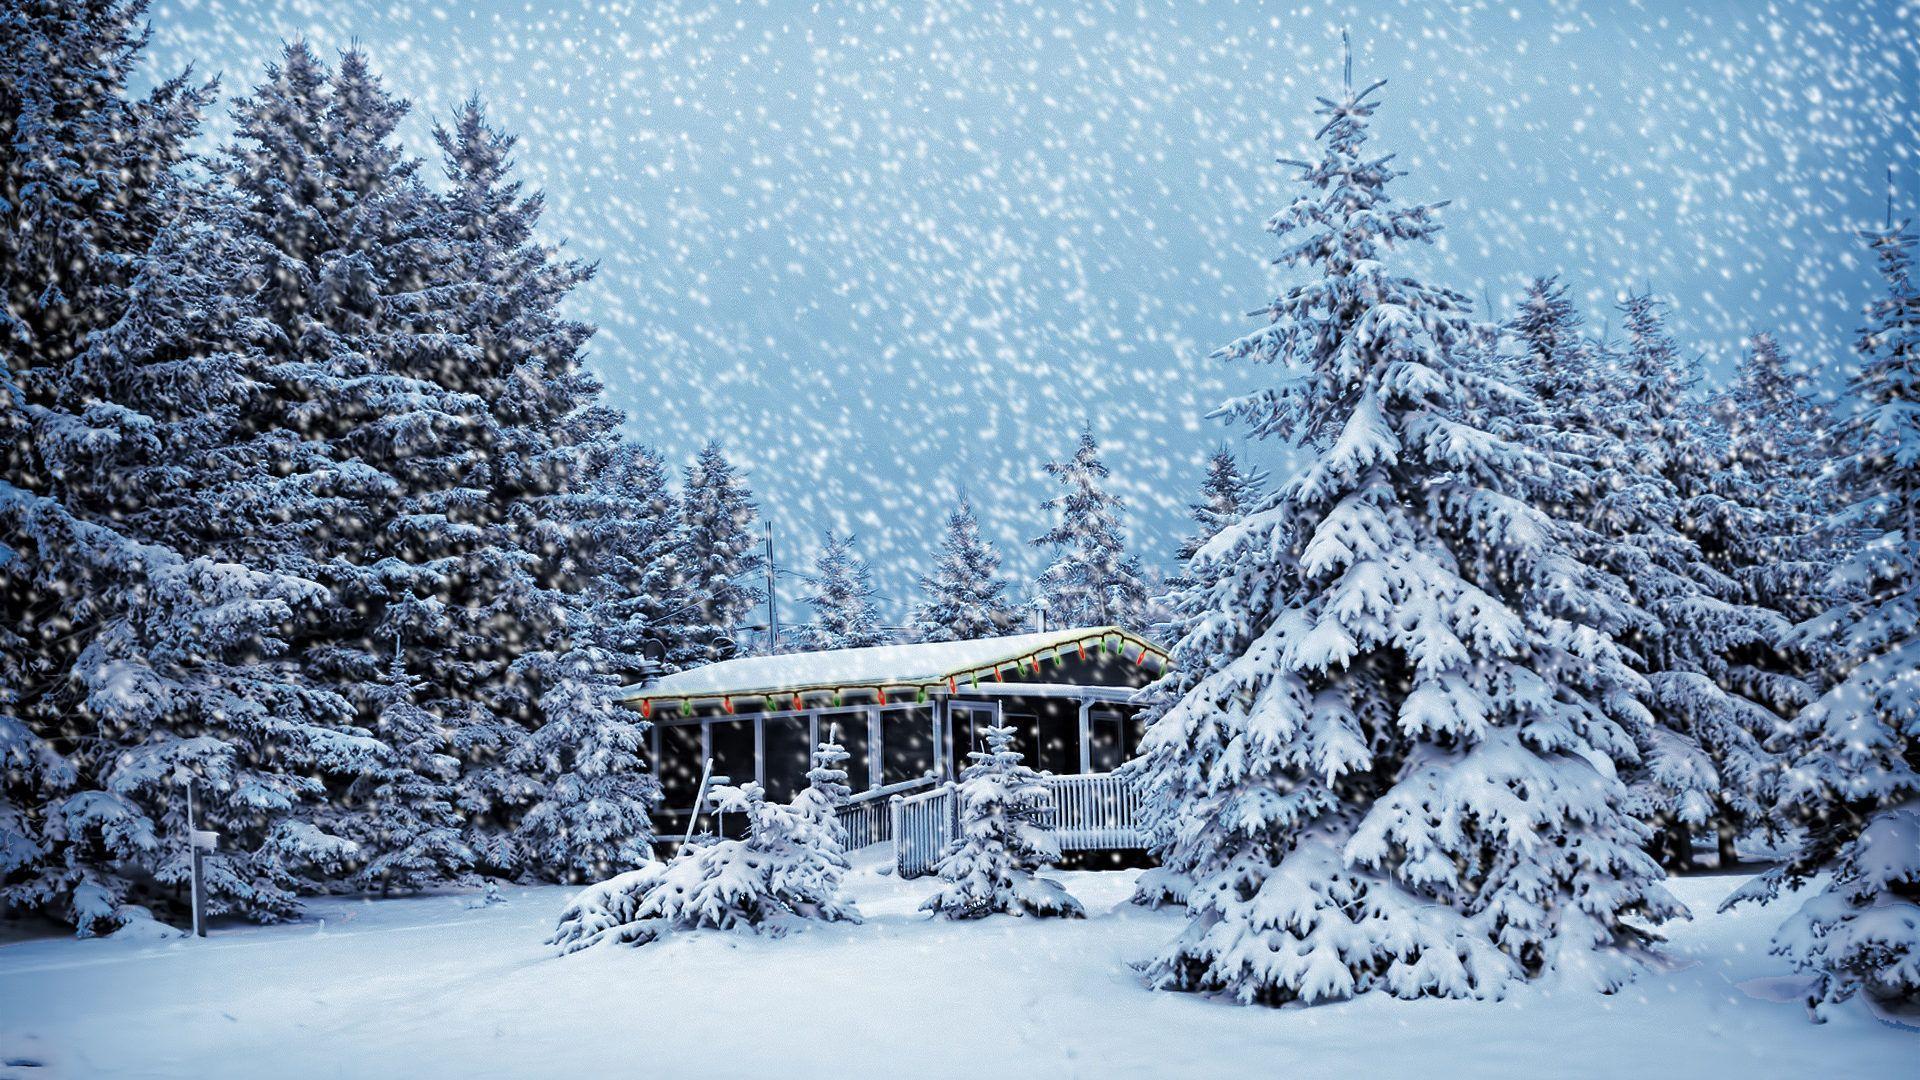 Enchanting Christmas Snow Wallpaper To Your Mobile Phone N